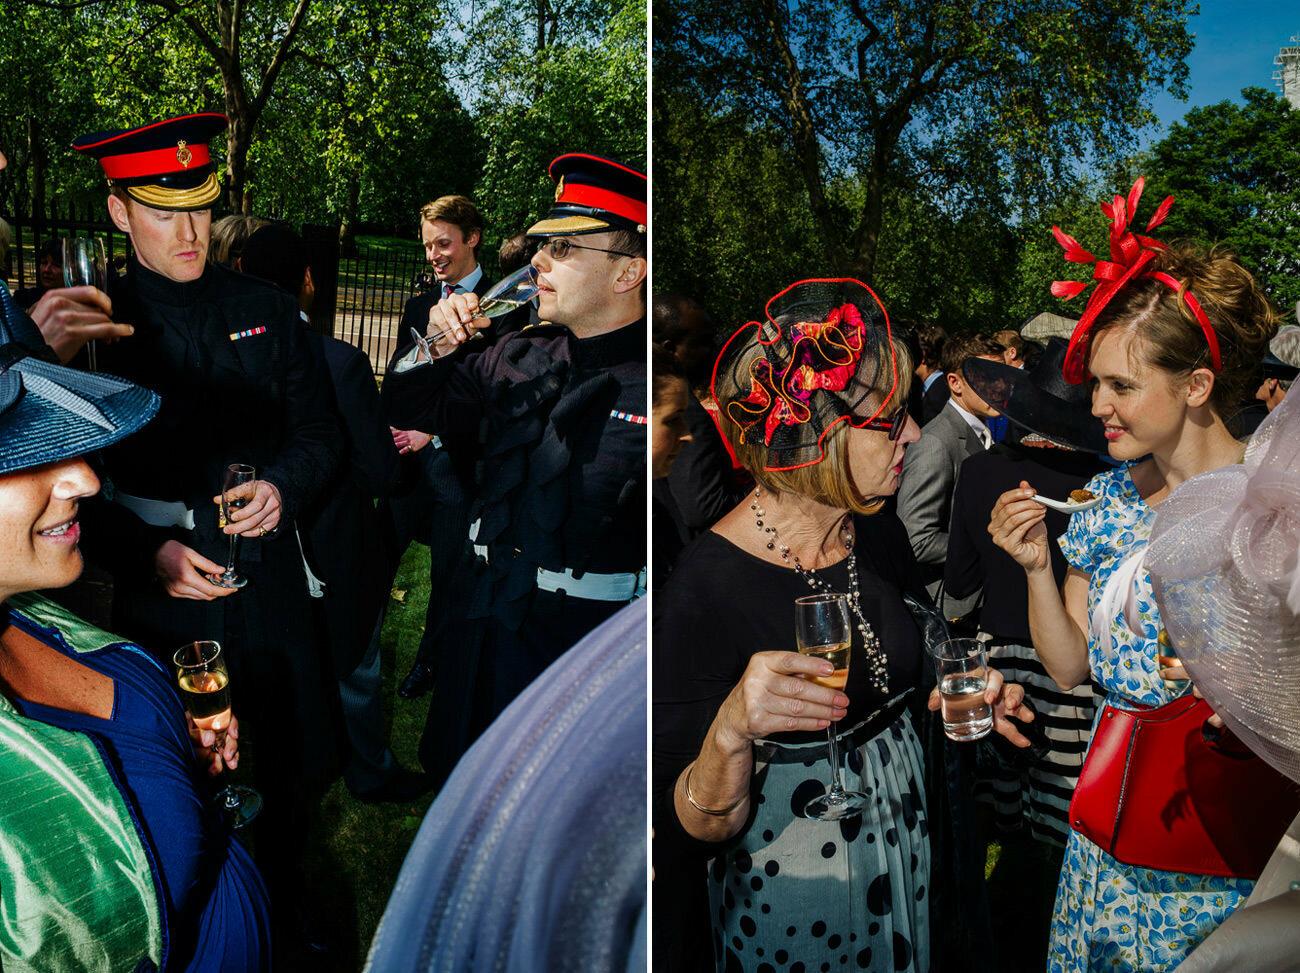 International Photo Award IPA Honorable Mention, Wedding: People